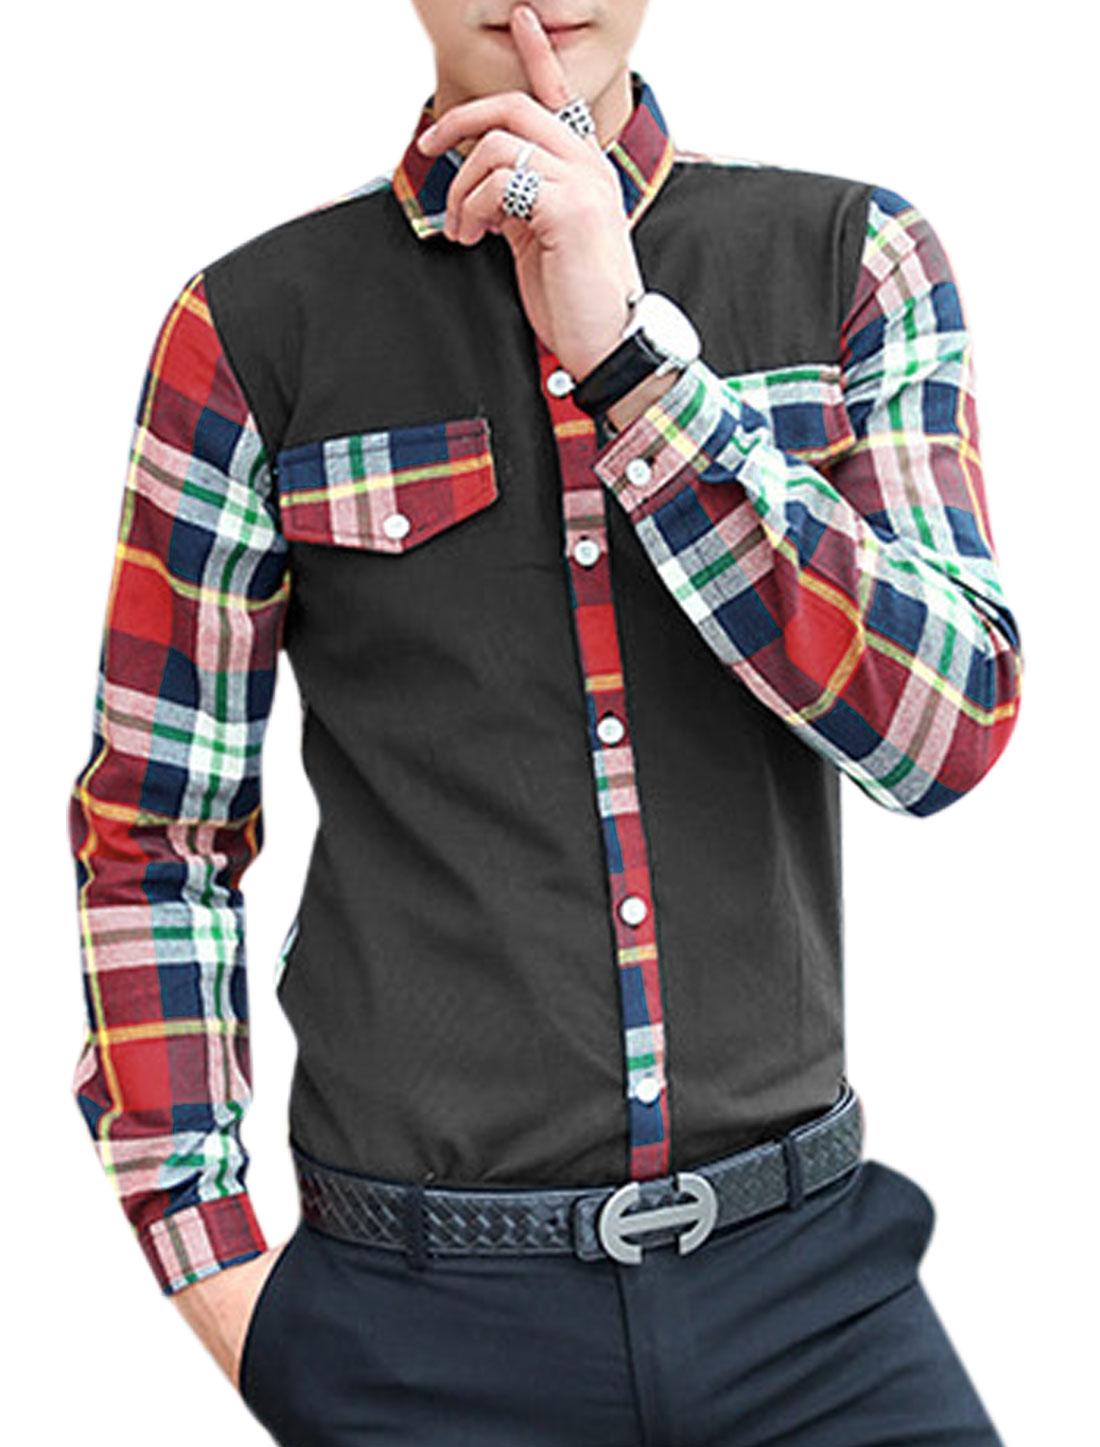 Men Plaids Pattern Single Breasted Mock Chest Pockets Shirt Red Black M